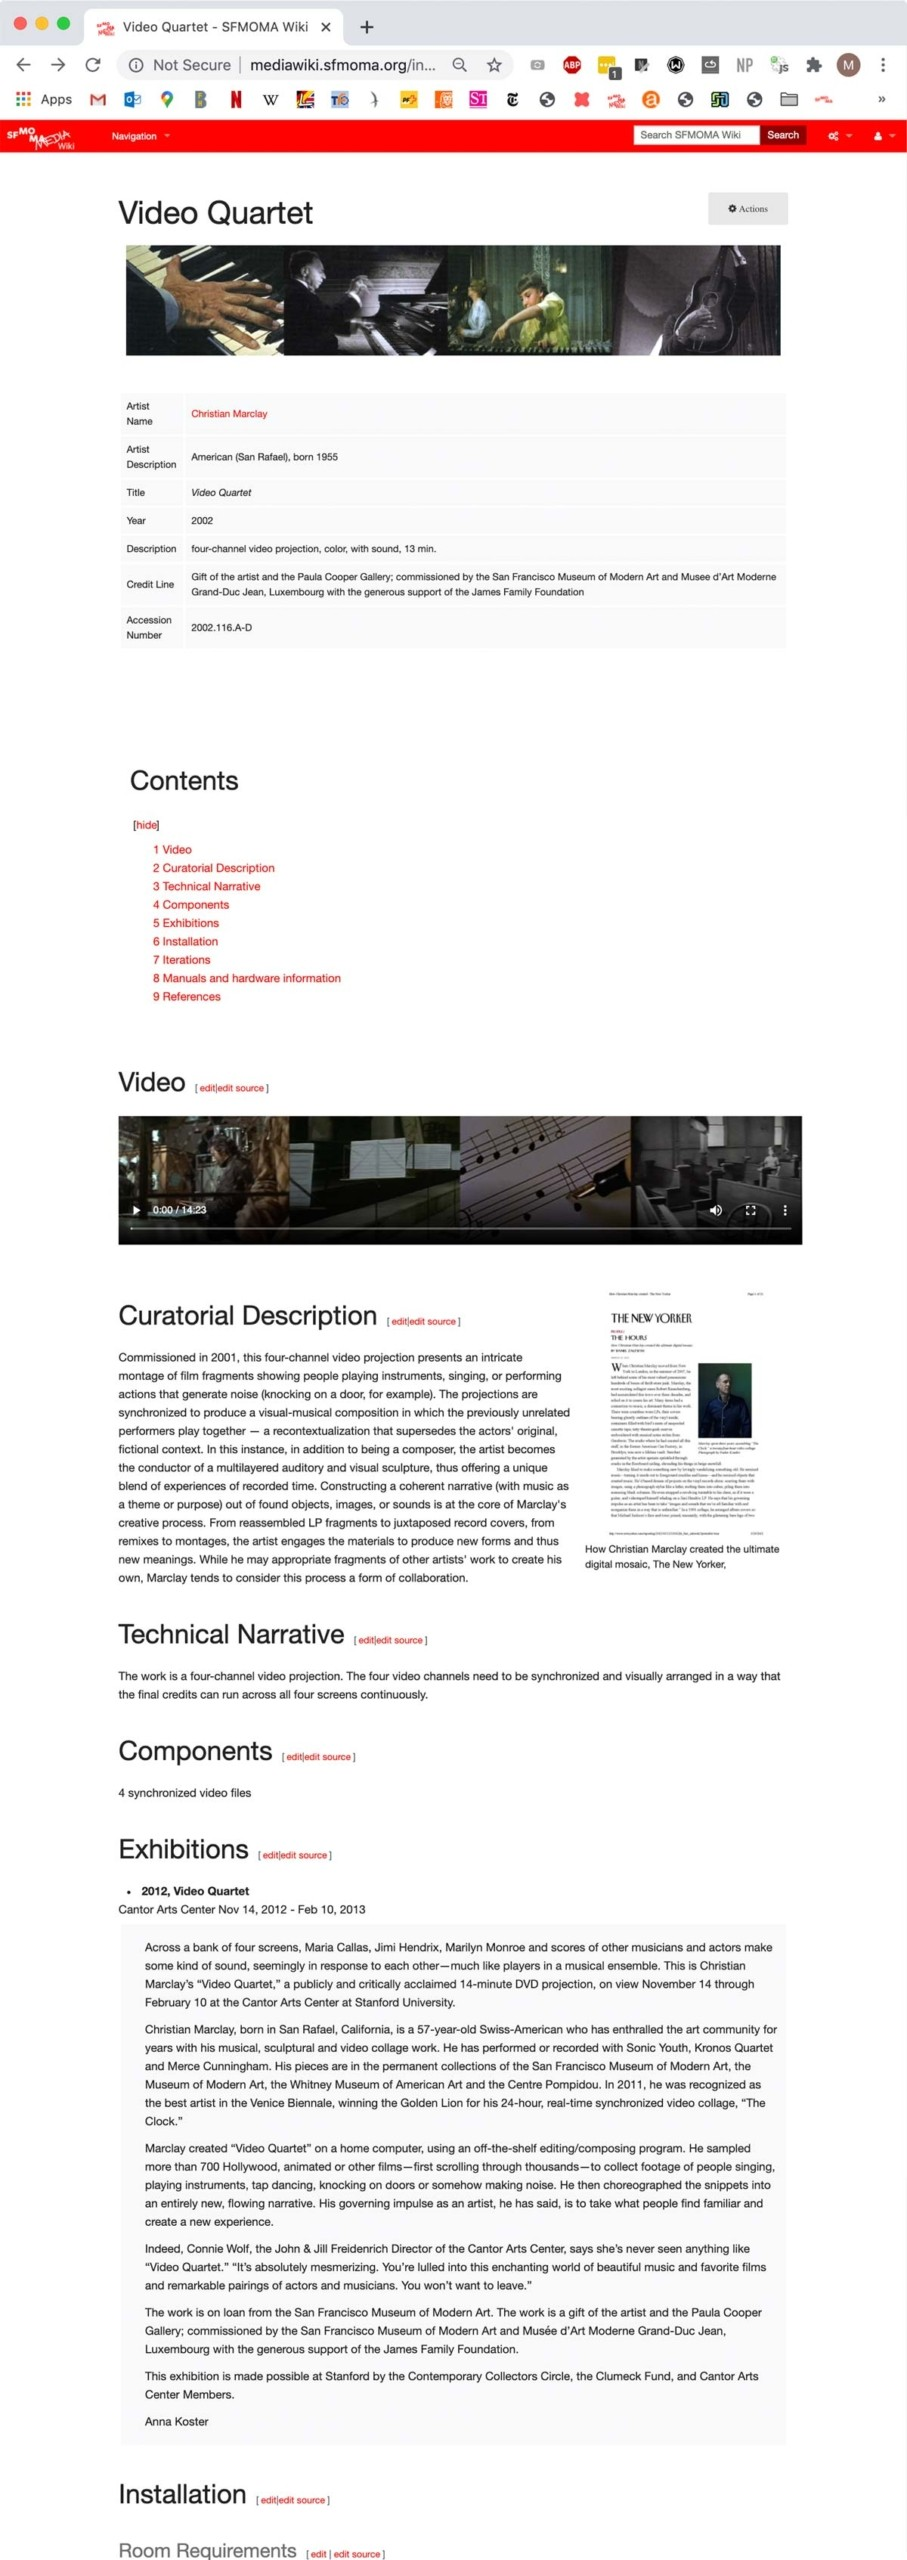 Figure 5. View of the Video Quartet artwork page on SFMOMA's MediaWiki documentation platform.